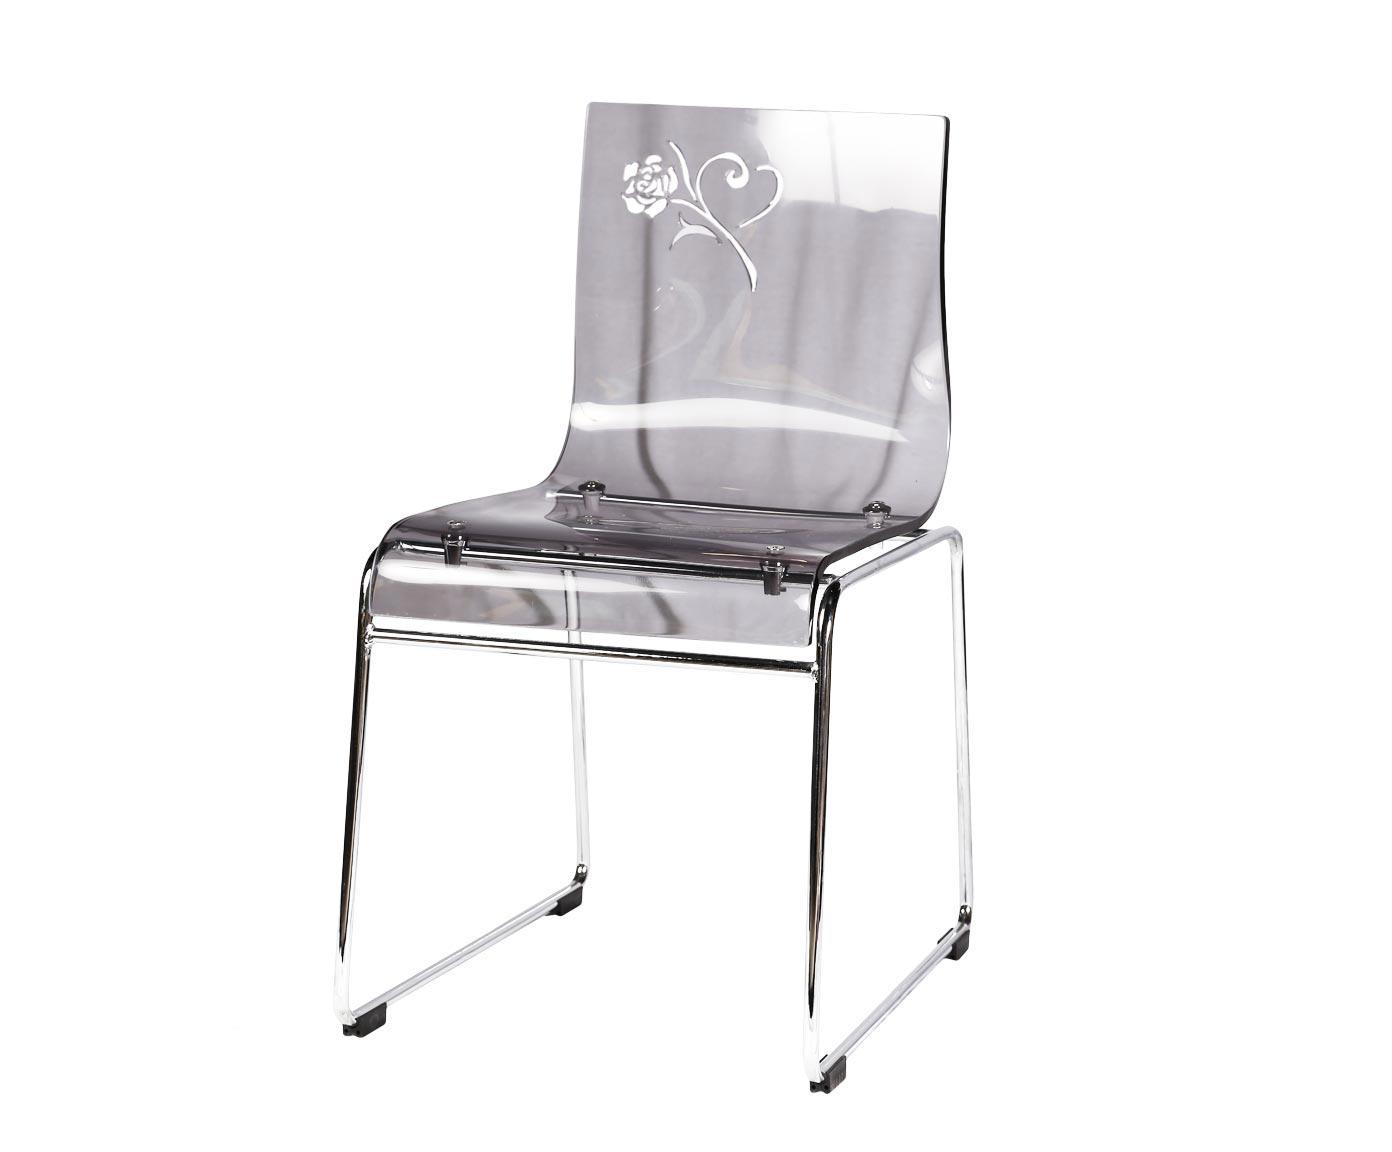 СтулОбеденные стулья<br><br><br>Material: Пластик<br>Width см: 61<br>Depth см: 51<br>Height см: 50